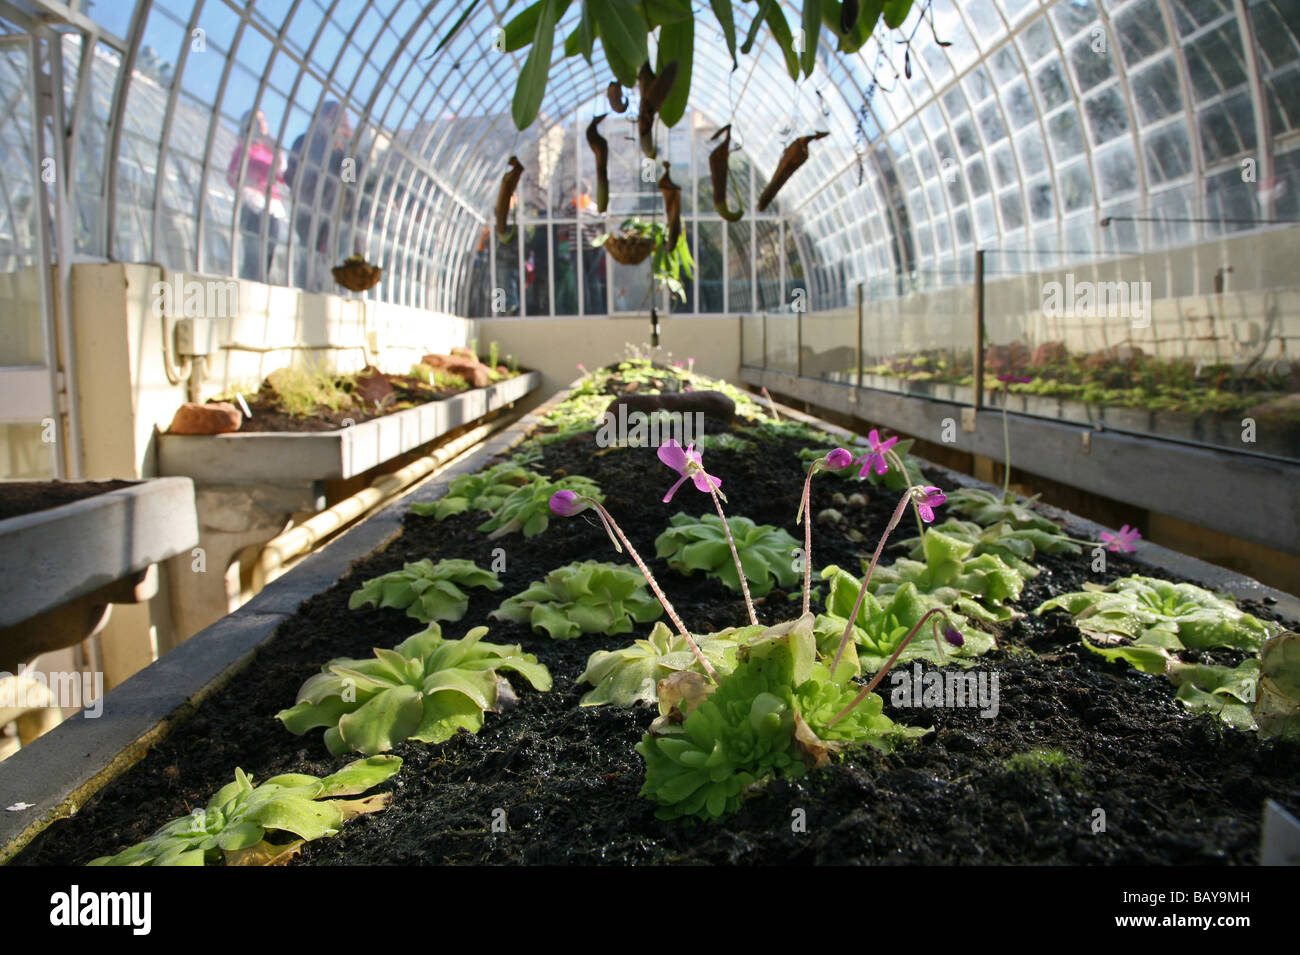 Jardin Botanico, Spainu0027s First Botanical Garden, Glass House, Valencia,  Spain